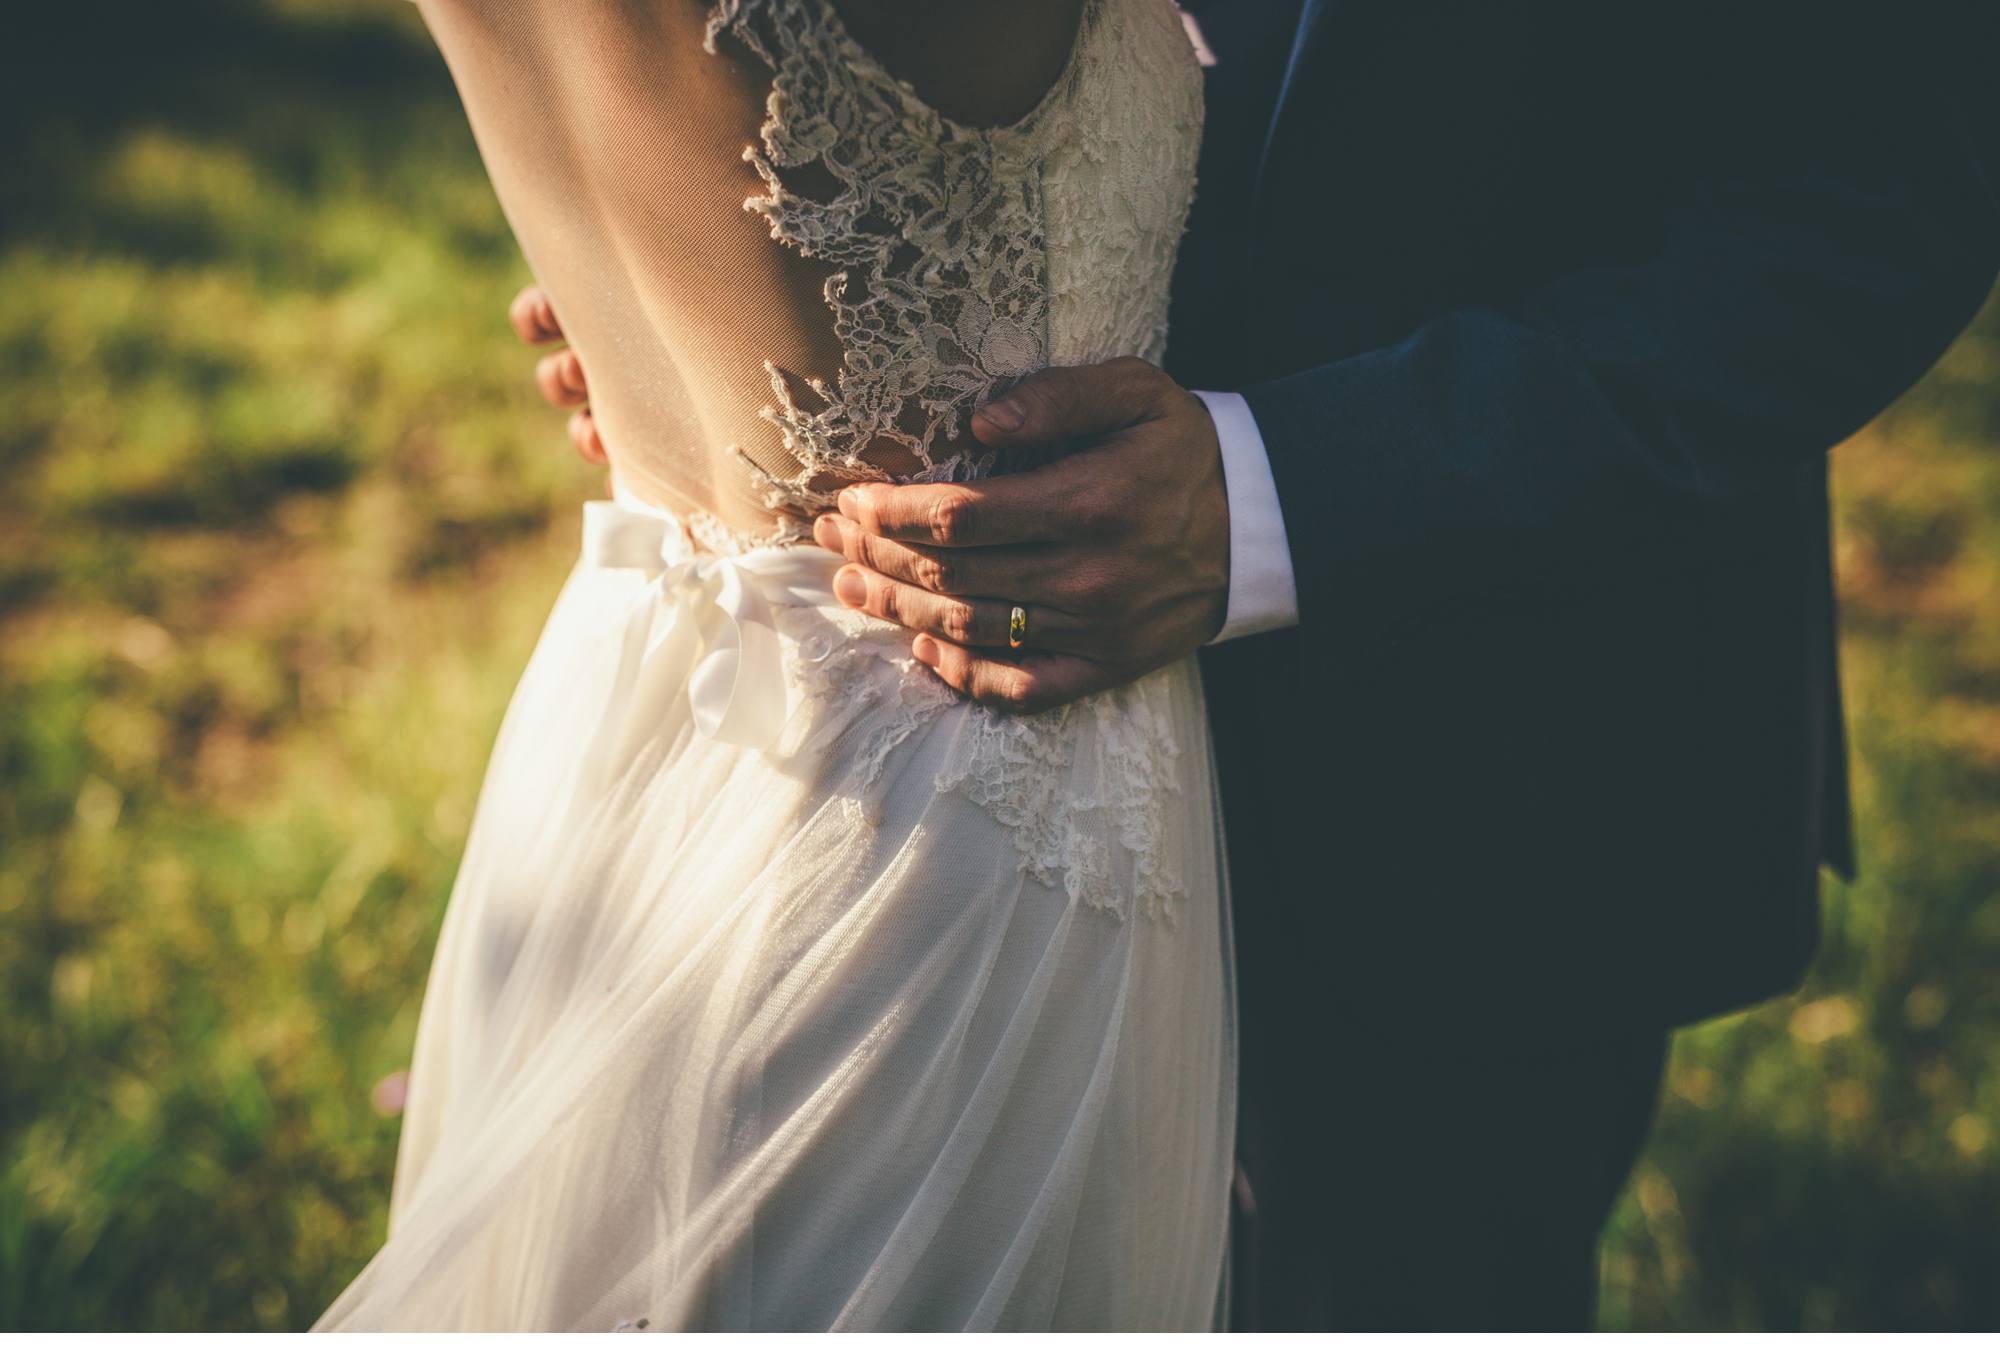 Austin Wedding Photographer, Austin Wedding Photography, Hill Country Wedding, Texas Wedding Photography, Vista West Ranch, Golden Hour Wedding, Dripping Springs Wedding Photographer